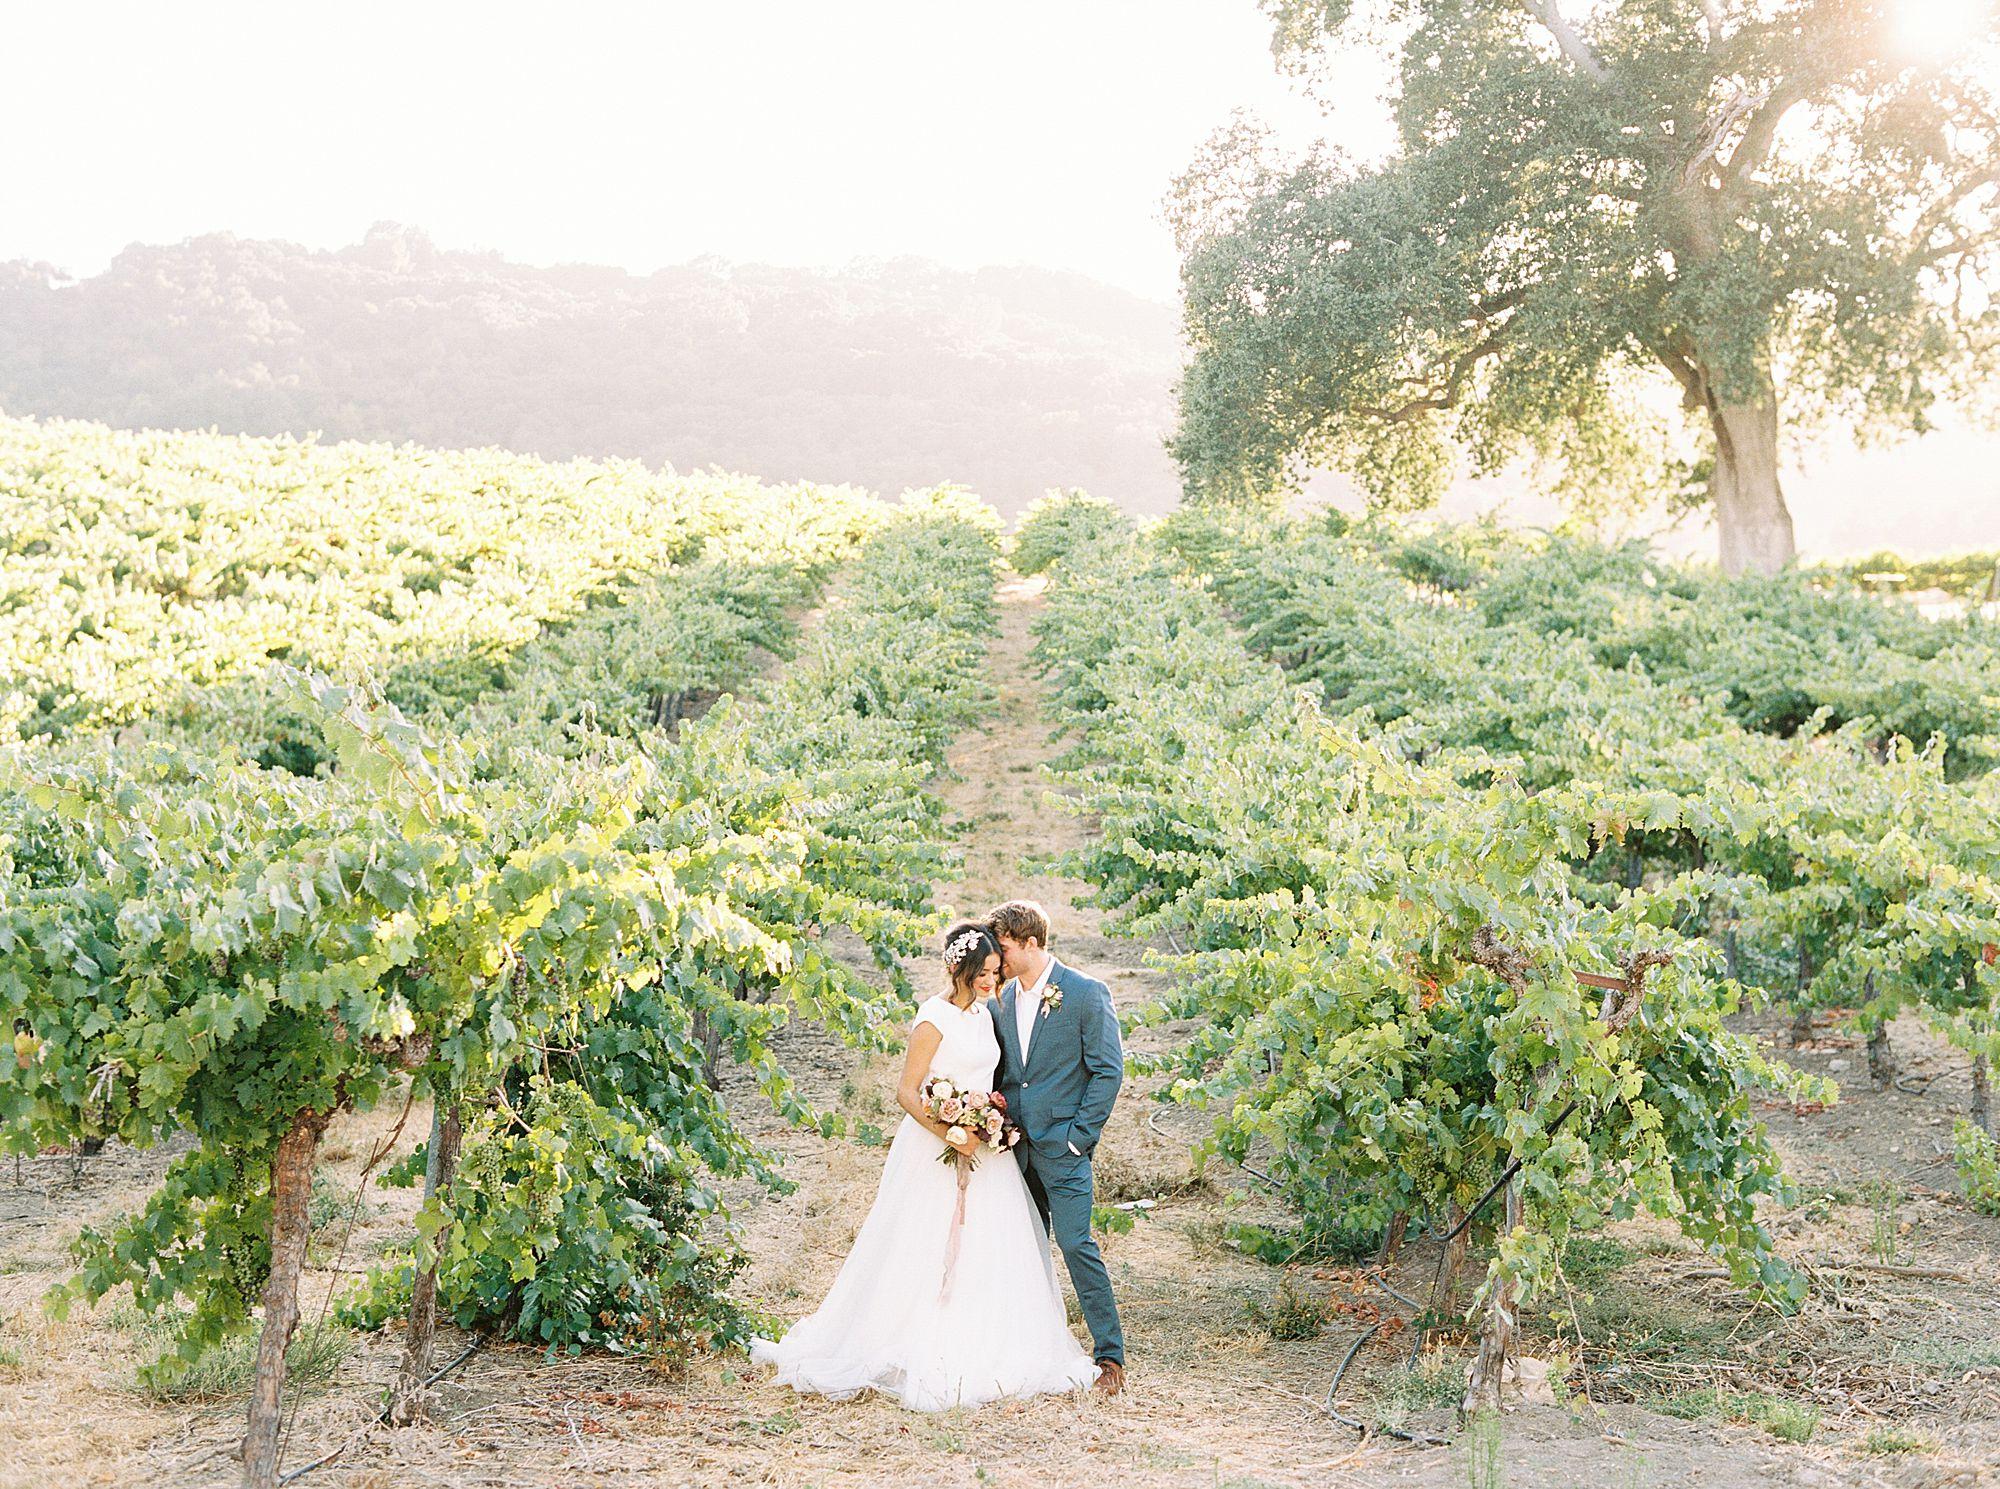 HammerSky Wedding Inspiration Featured on Hey Wedding Lady with Vanessa Noel Events - Ashley Baumgartner - SLO Wedding Photographer_0016.jpg